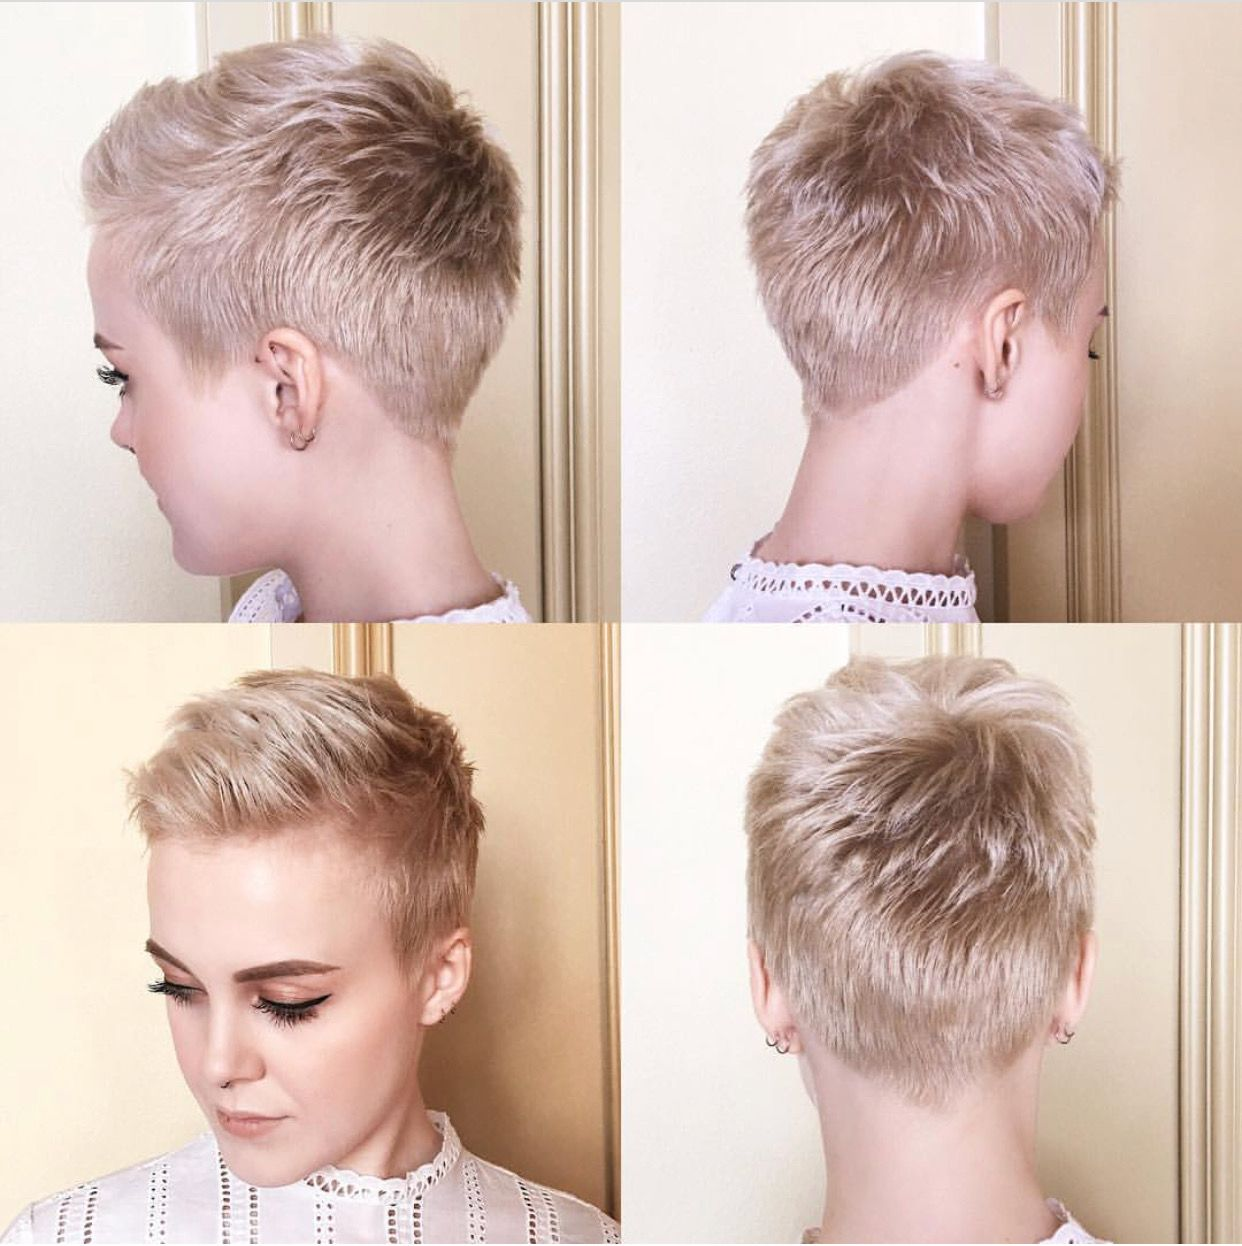 Tunsoare Coafuri Hair Cuts Short Hair Styles Short Hair Cuts